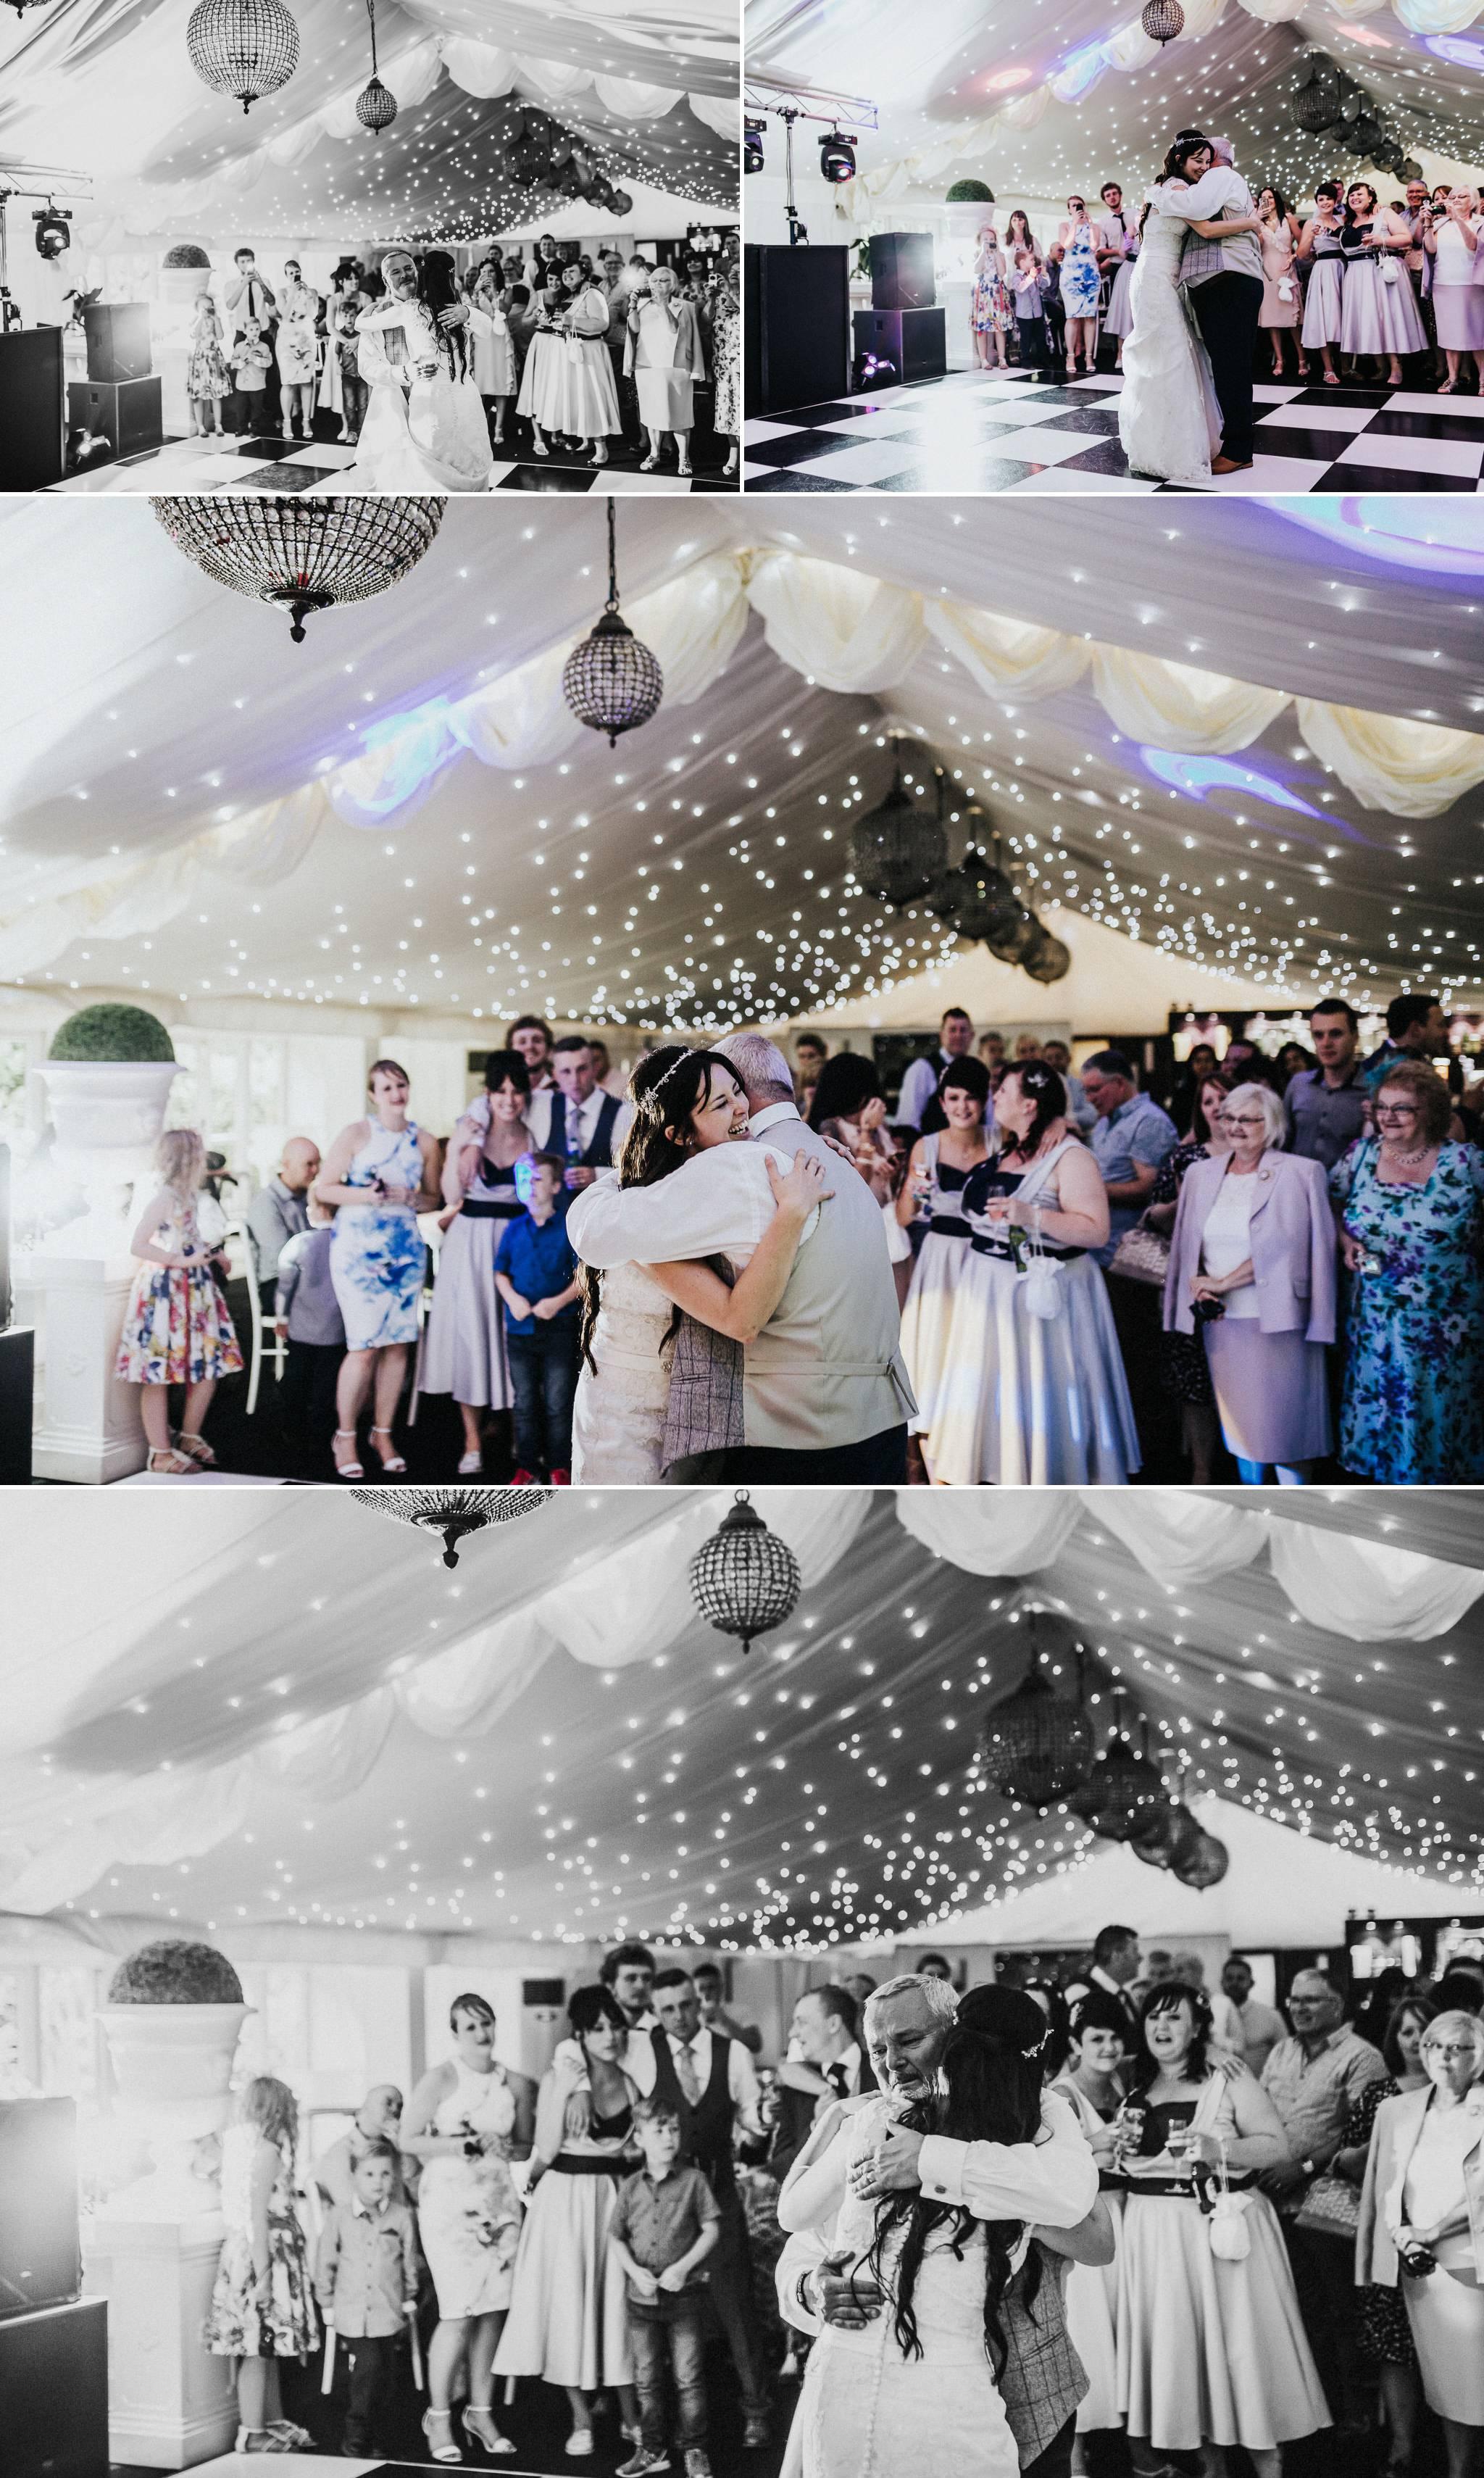 moxhull-hall-wedding-photography 21.jpg